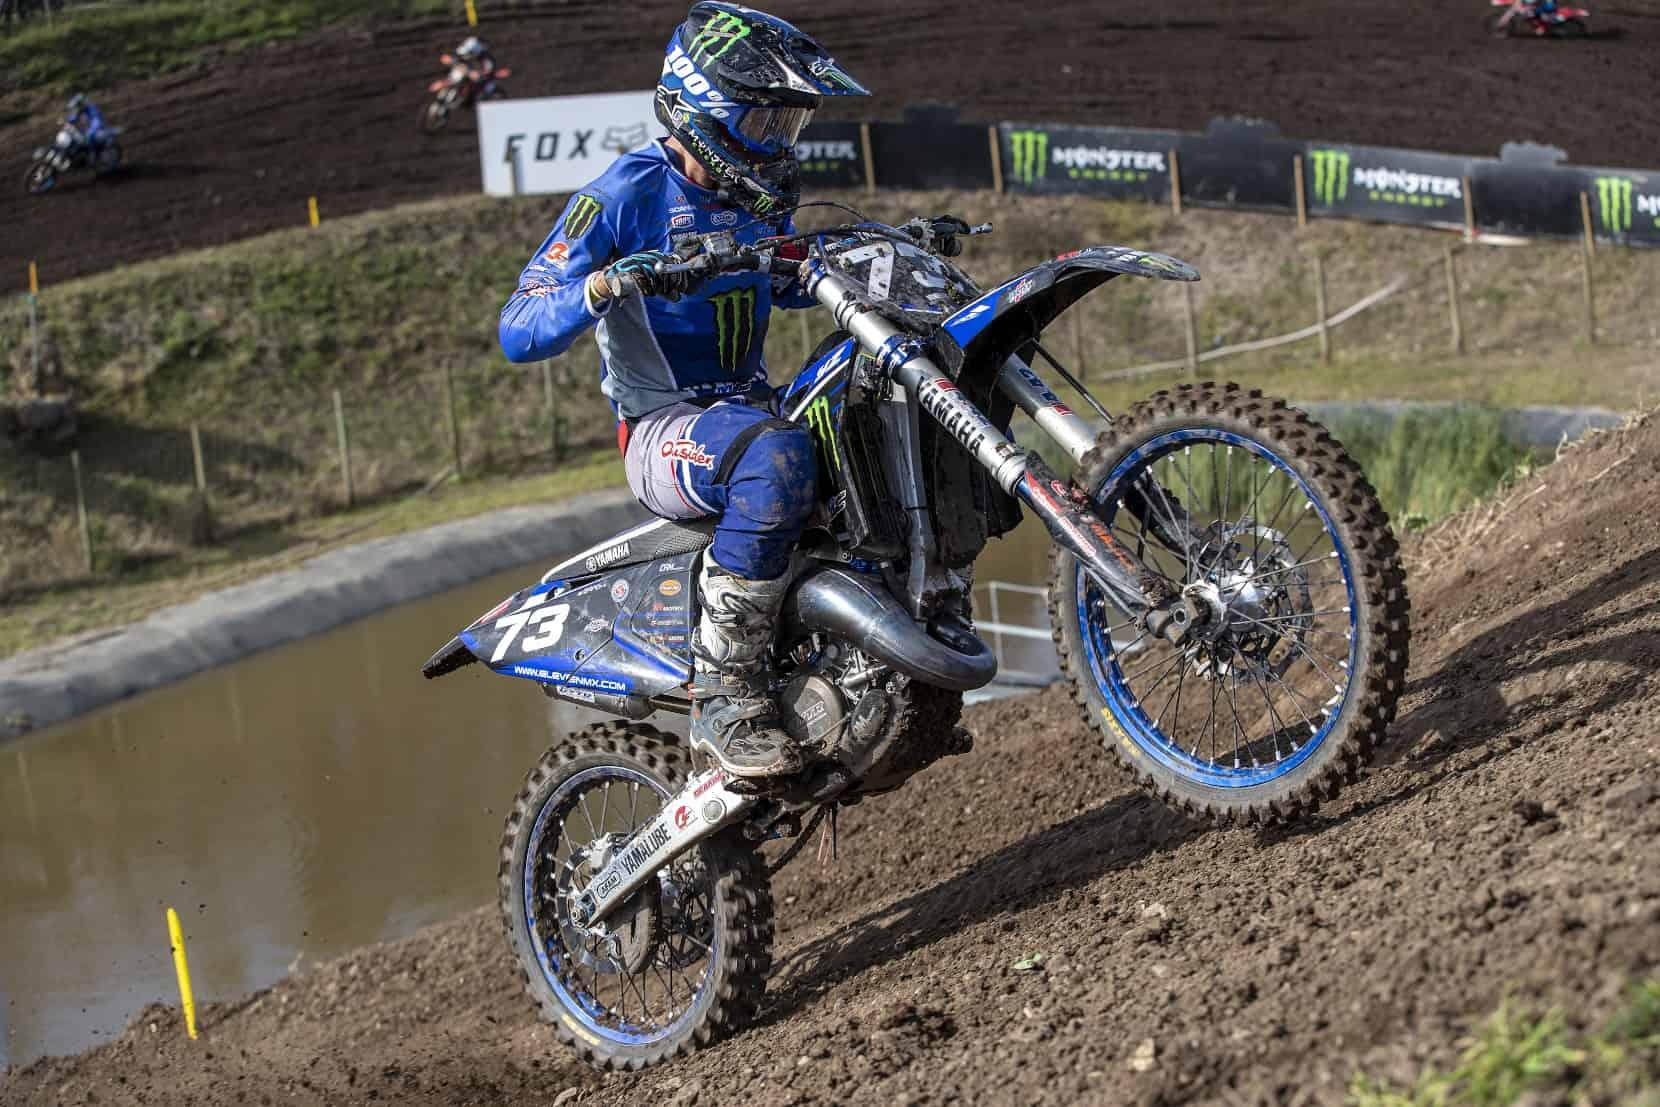 MXGP of France – Ergebnisse Klasse EMX125 Wertungslauf 2